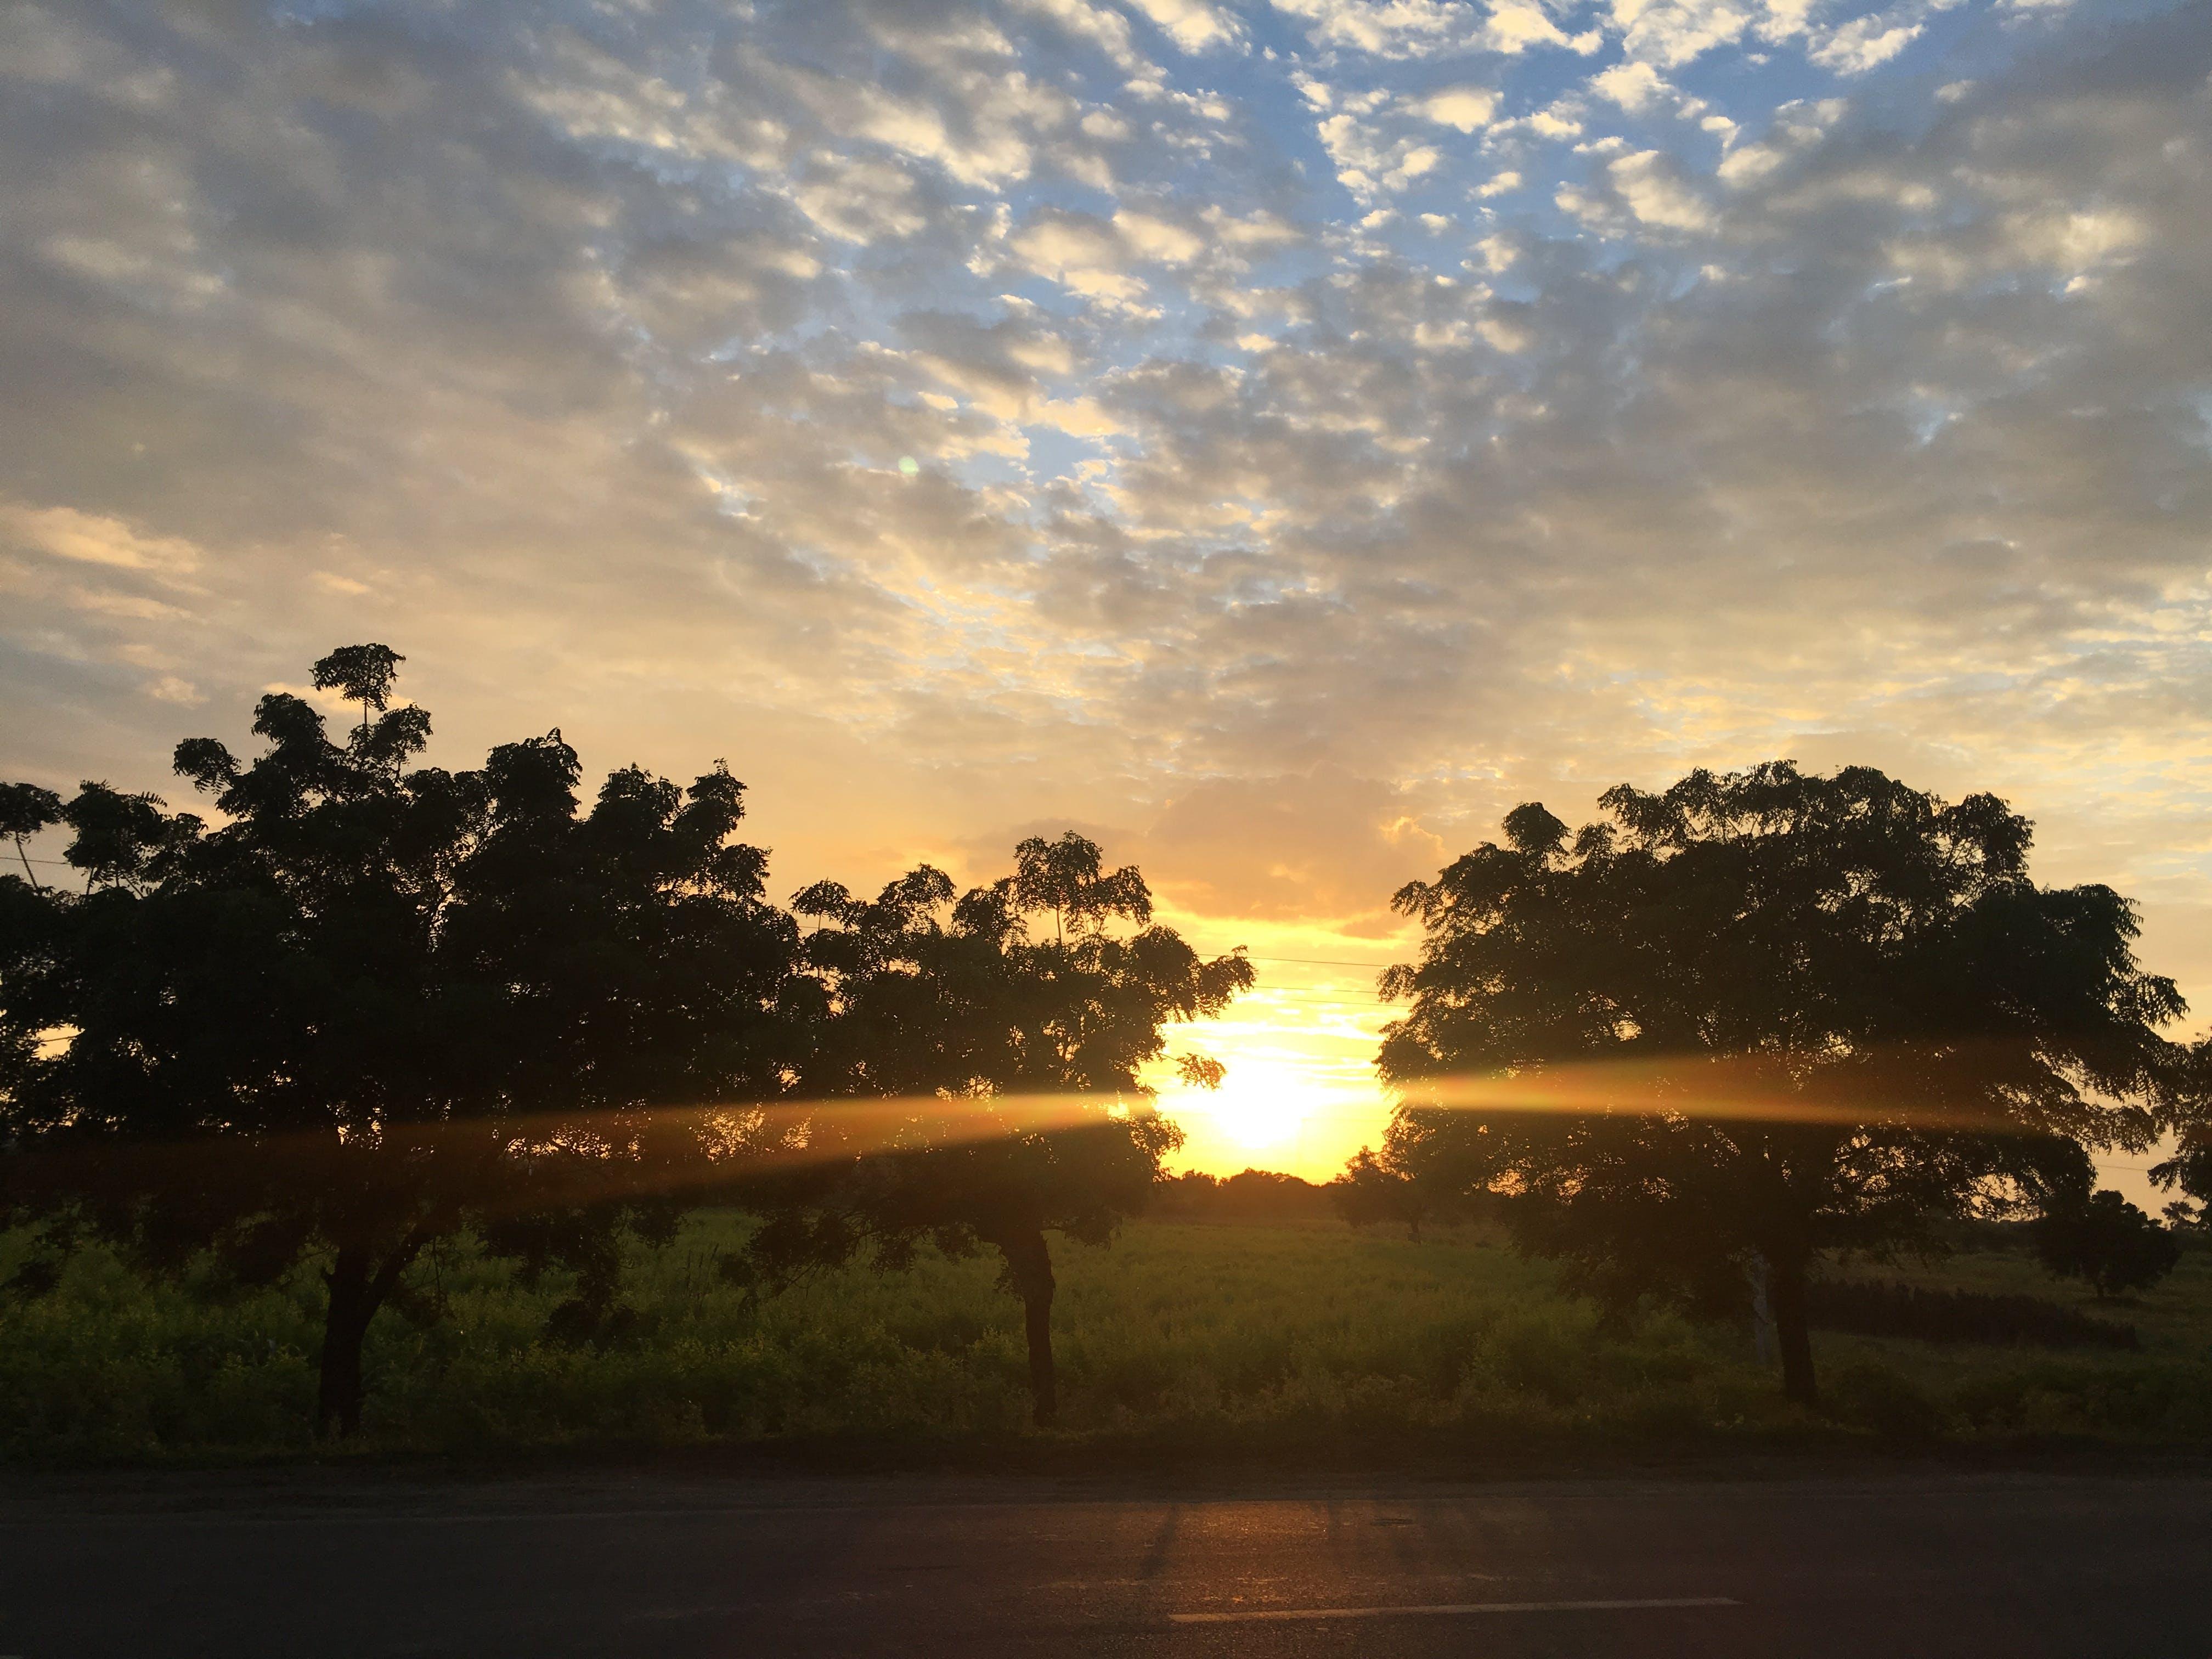 Kostenloses Stock Foto zu abendsonne, goldene sonne, orange himmel, sonnenuntergang